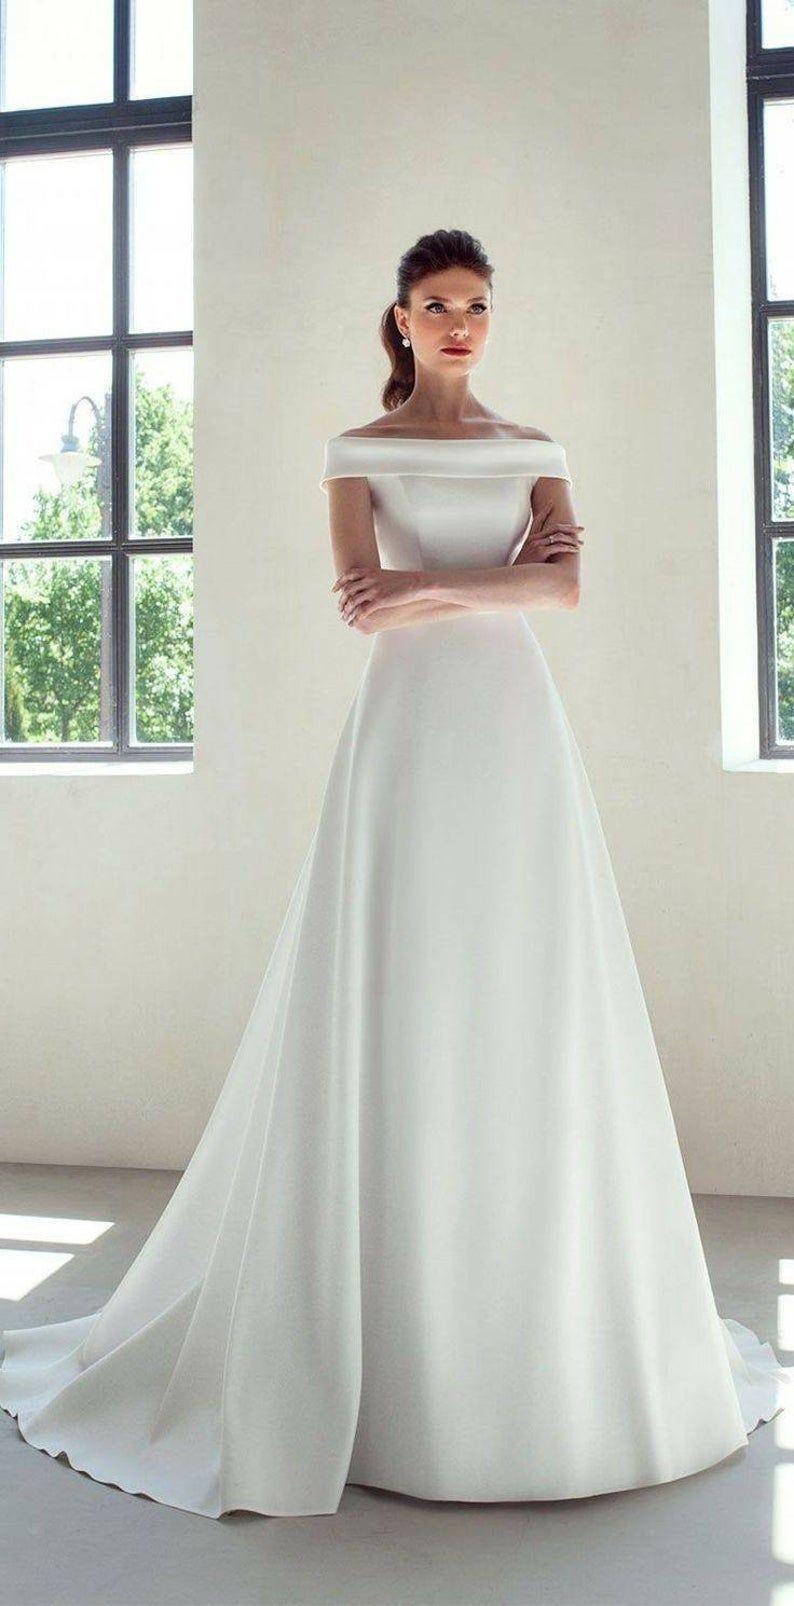 White Off Shoulder Satin Wedding Reception Dressafrican Women Etsy Simple Wedding Gowns Off Shoulder Wedding Dress Wedding Dresses [ 1606 x 794 Pixel ]